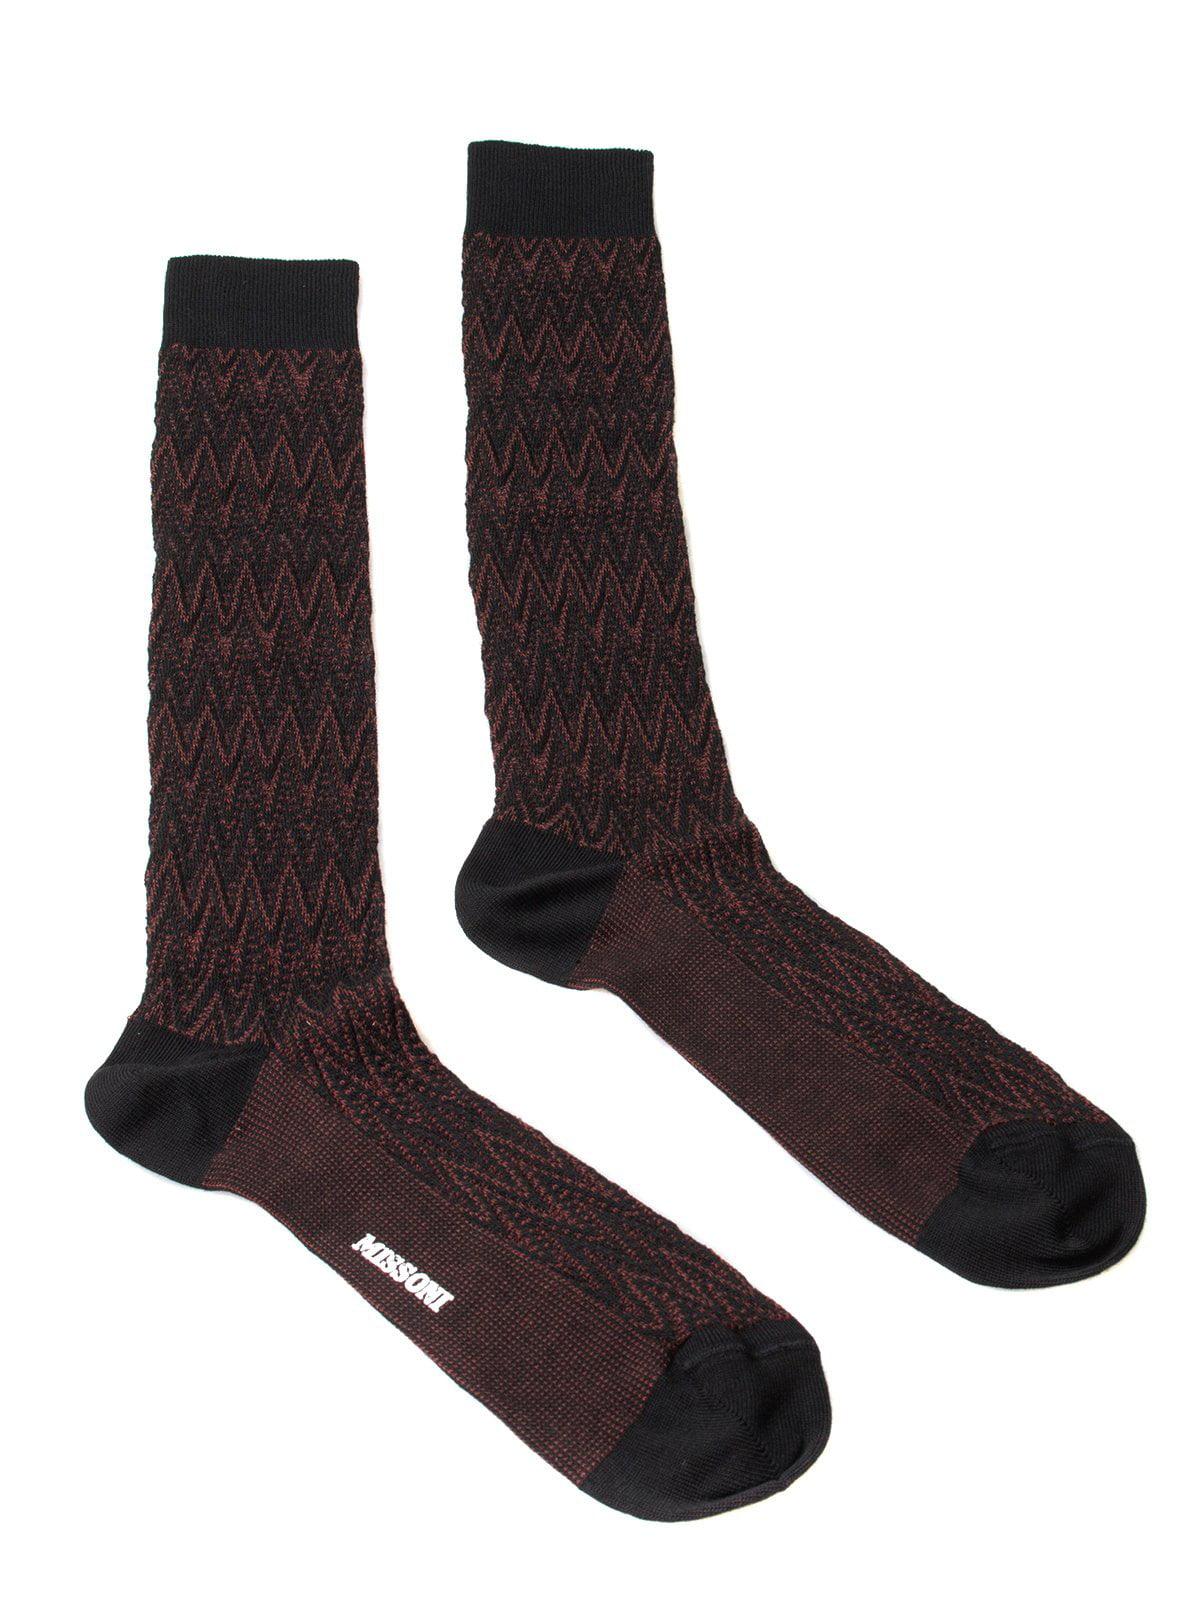 Missoni GM00CMU5239 0001 Maroon/Black Chevron Knee Length Socks